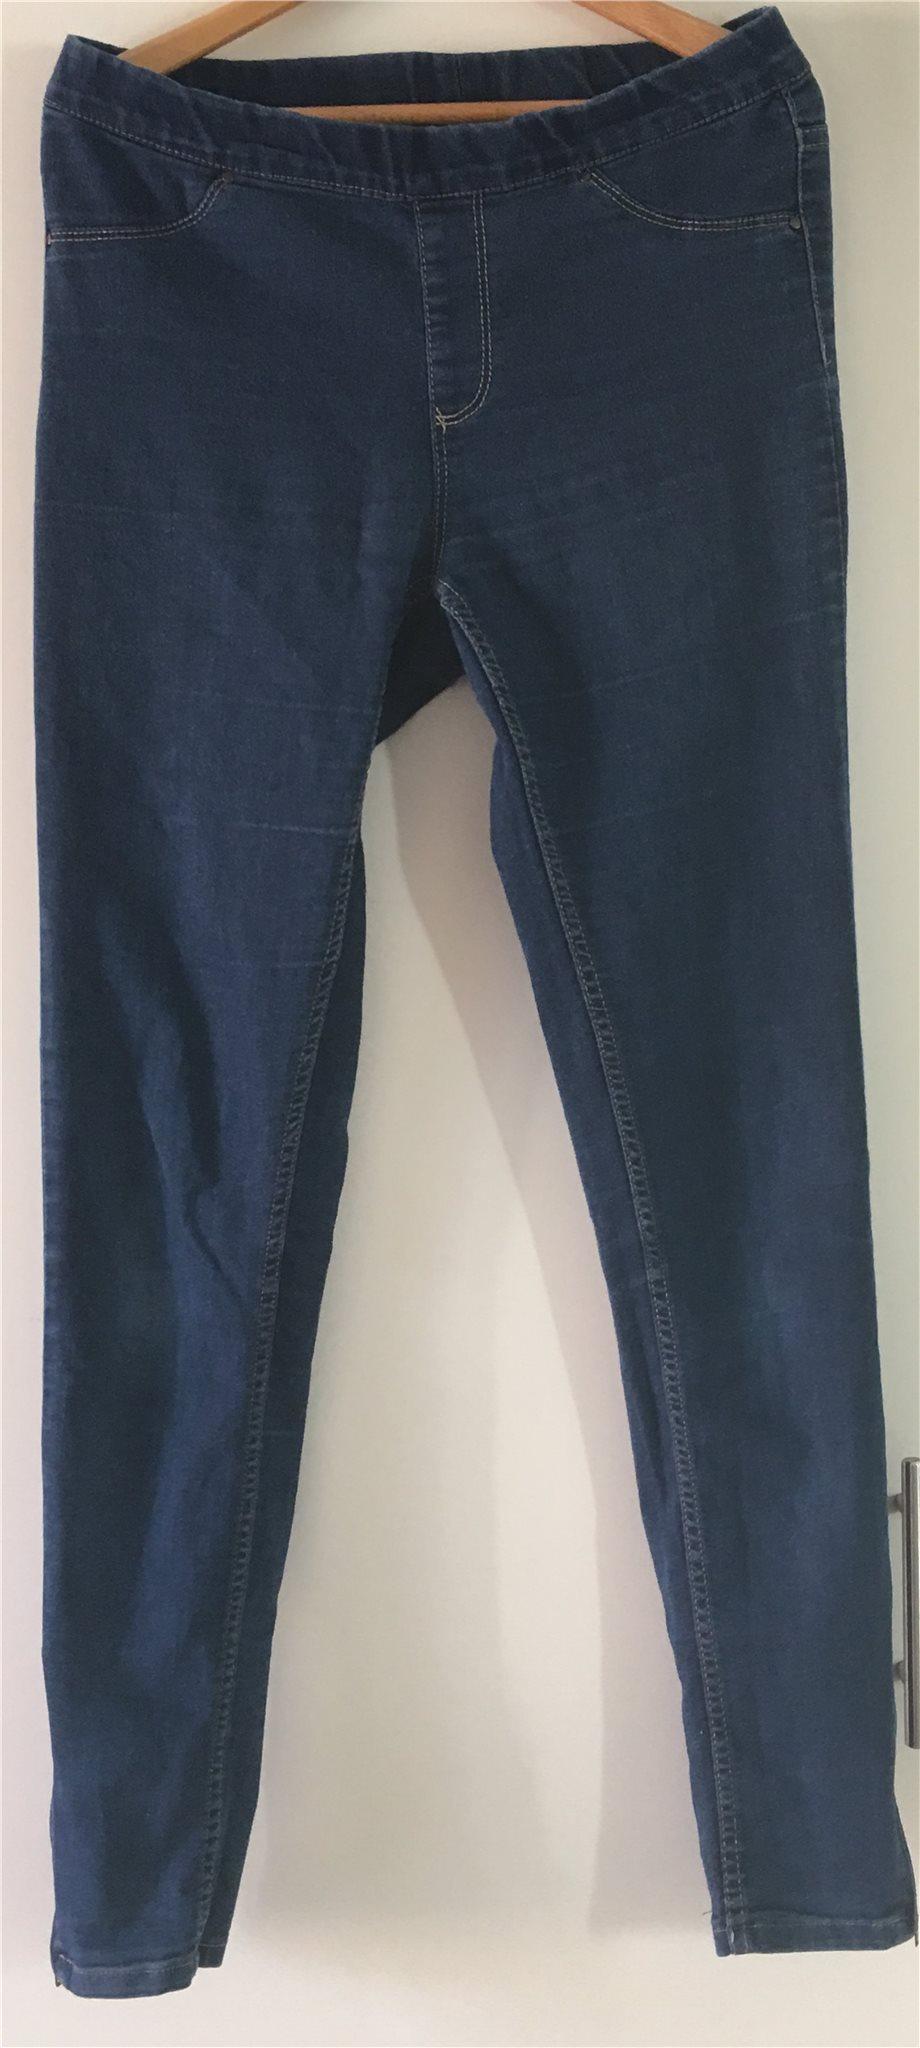 jeans leggings cubus